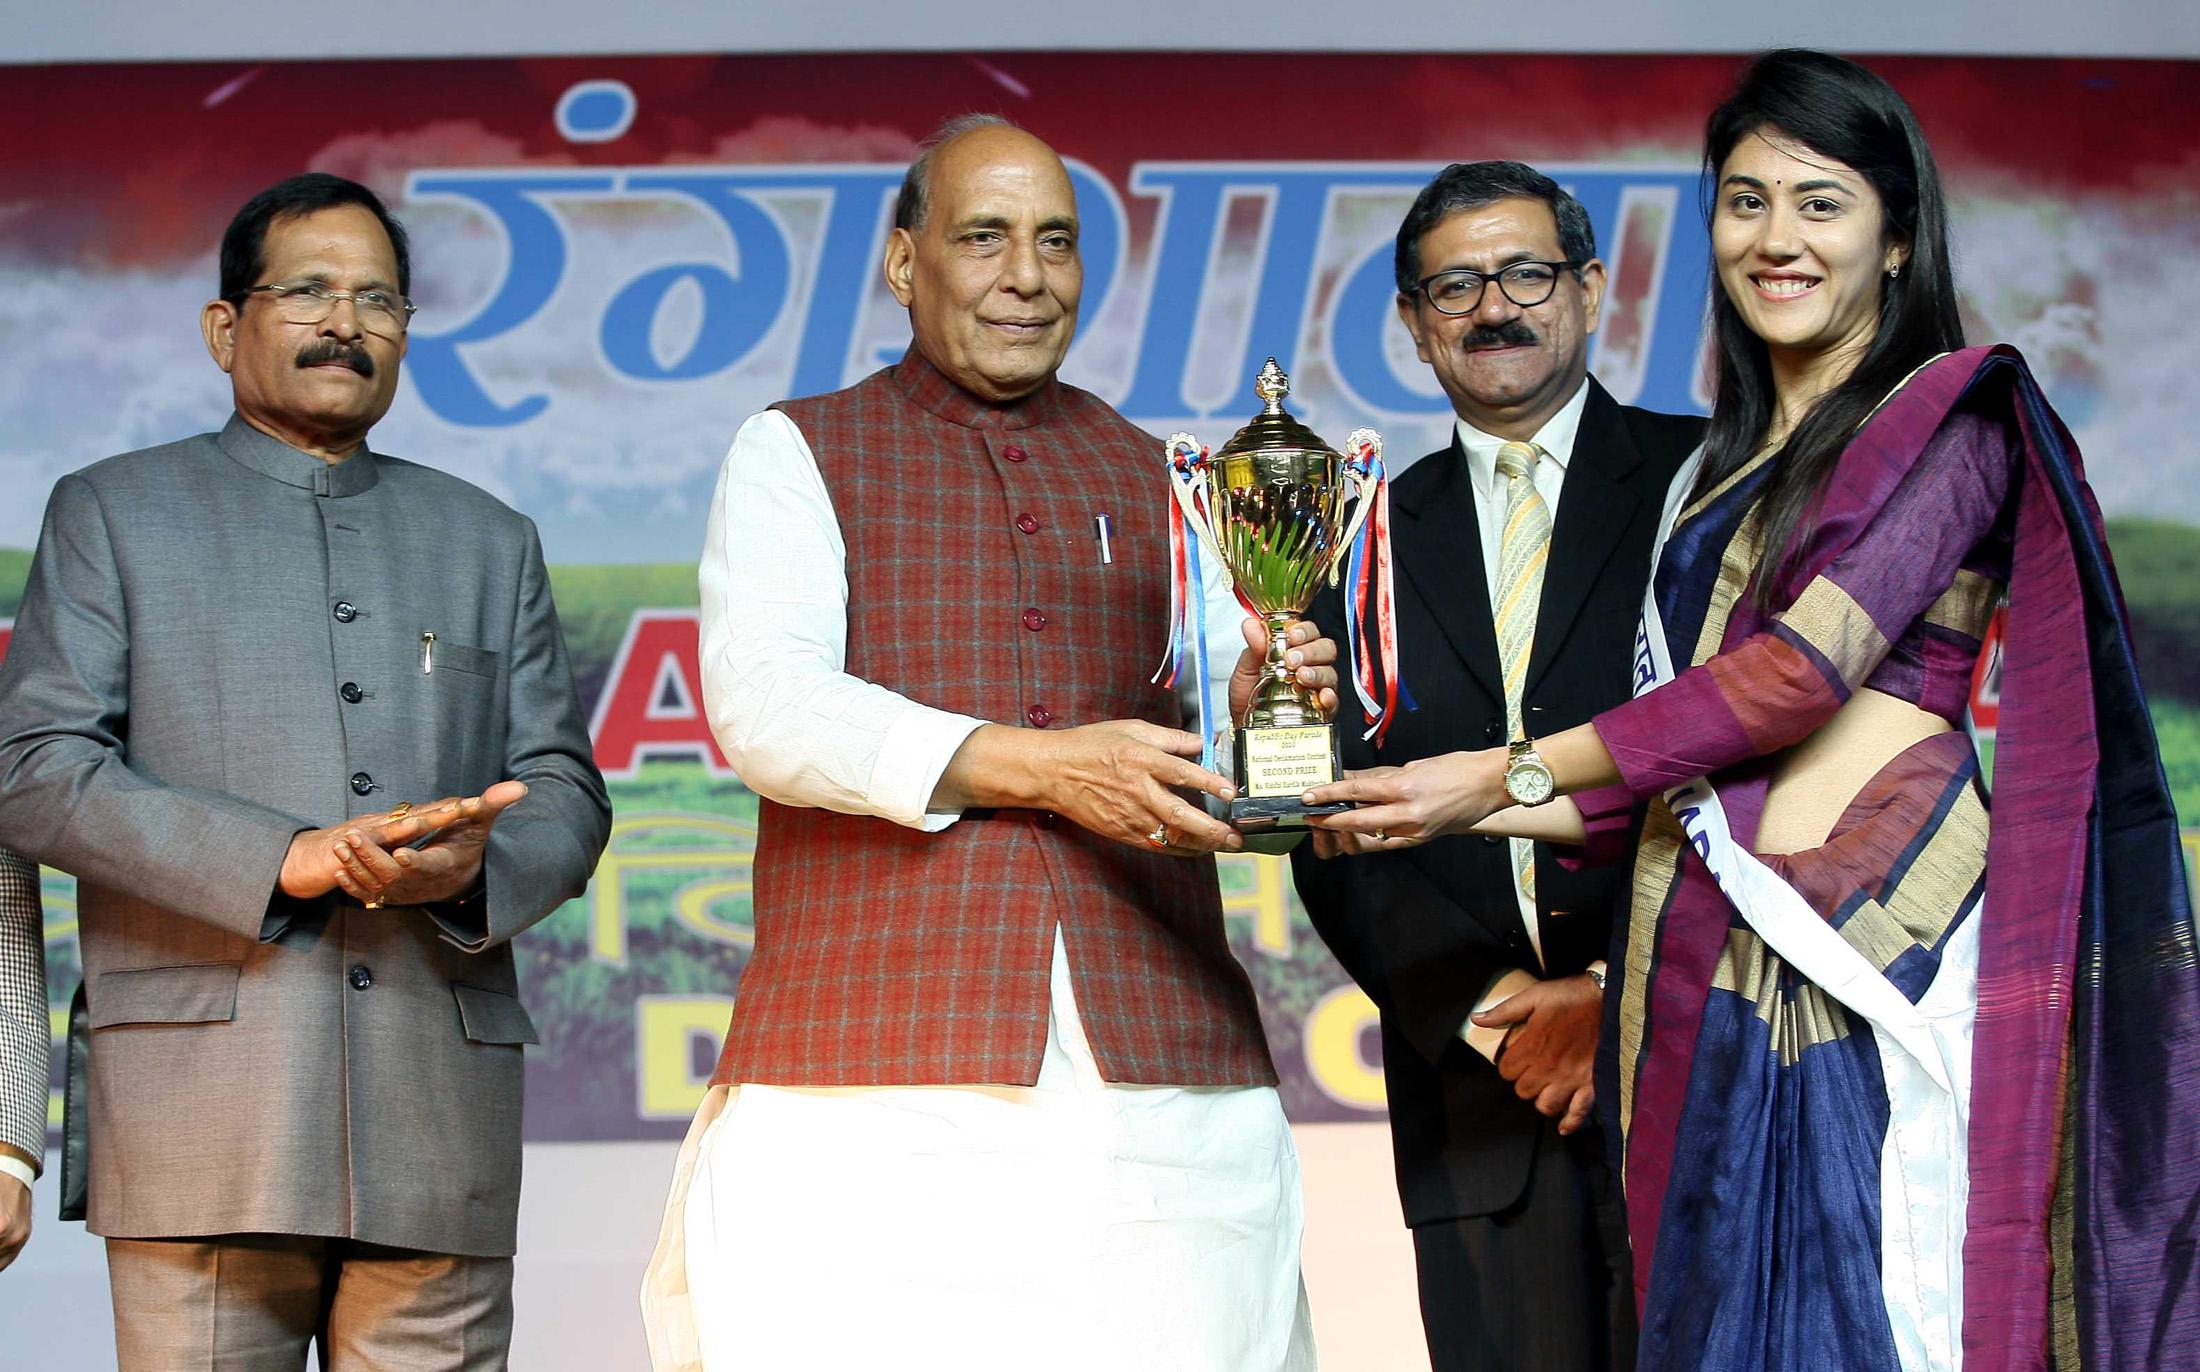 Raksha Mantri gives away awards related to Republic Day 2020